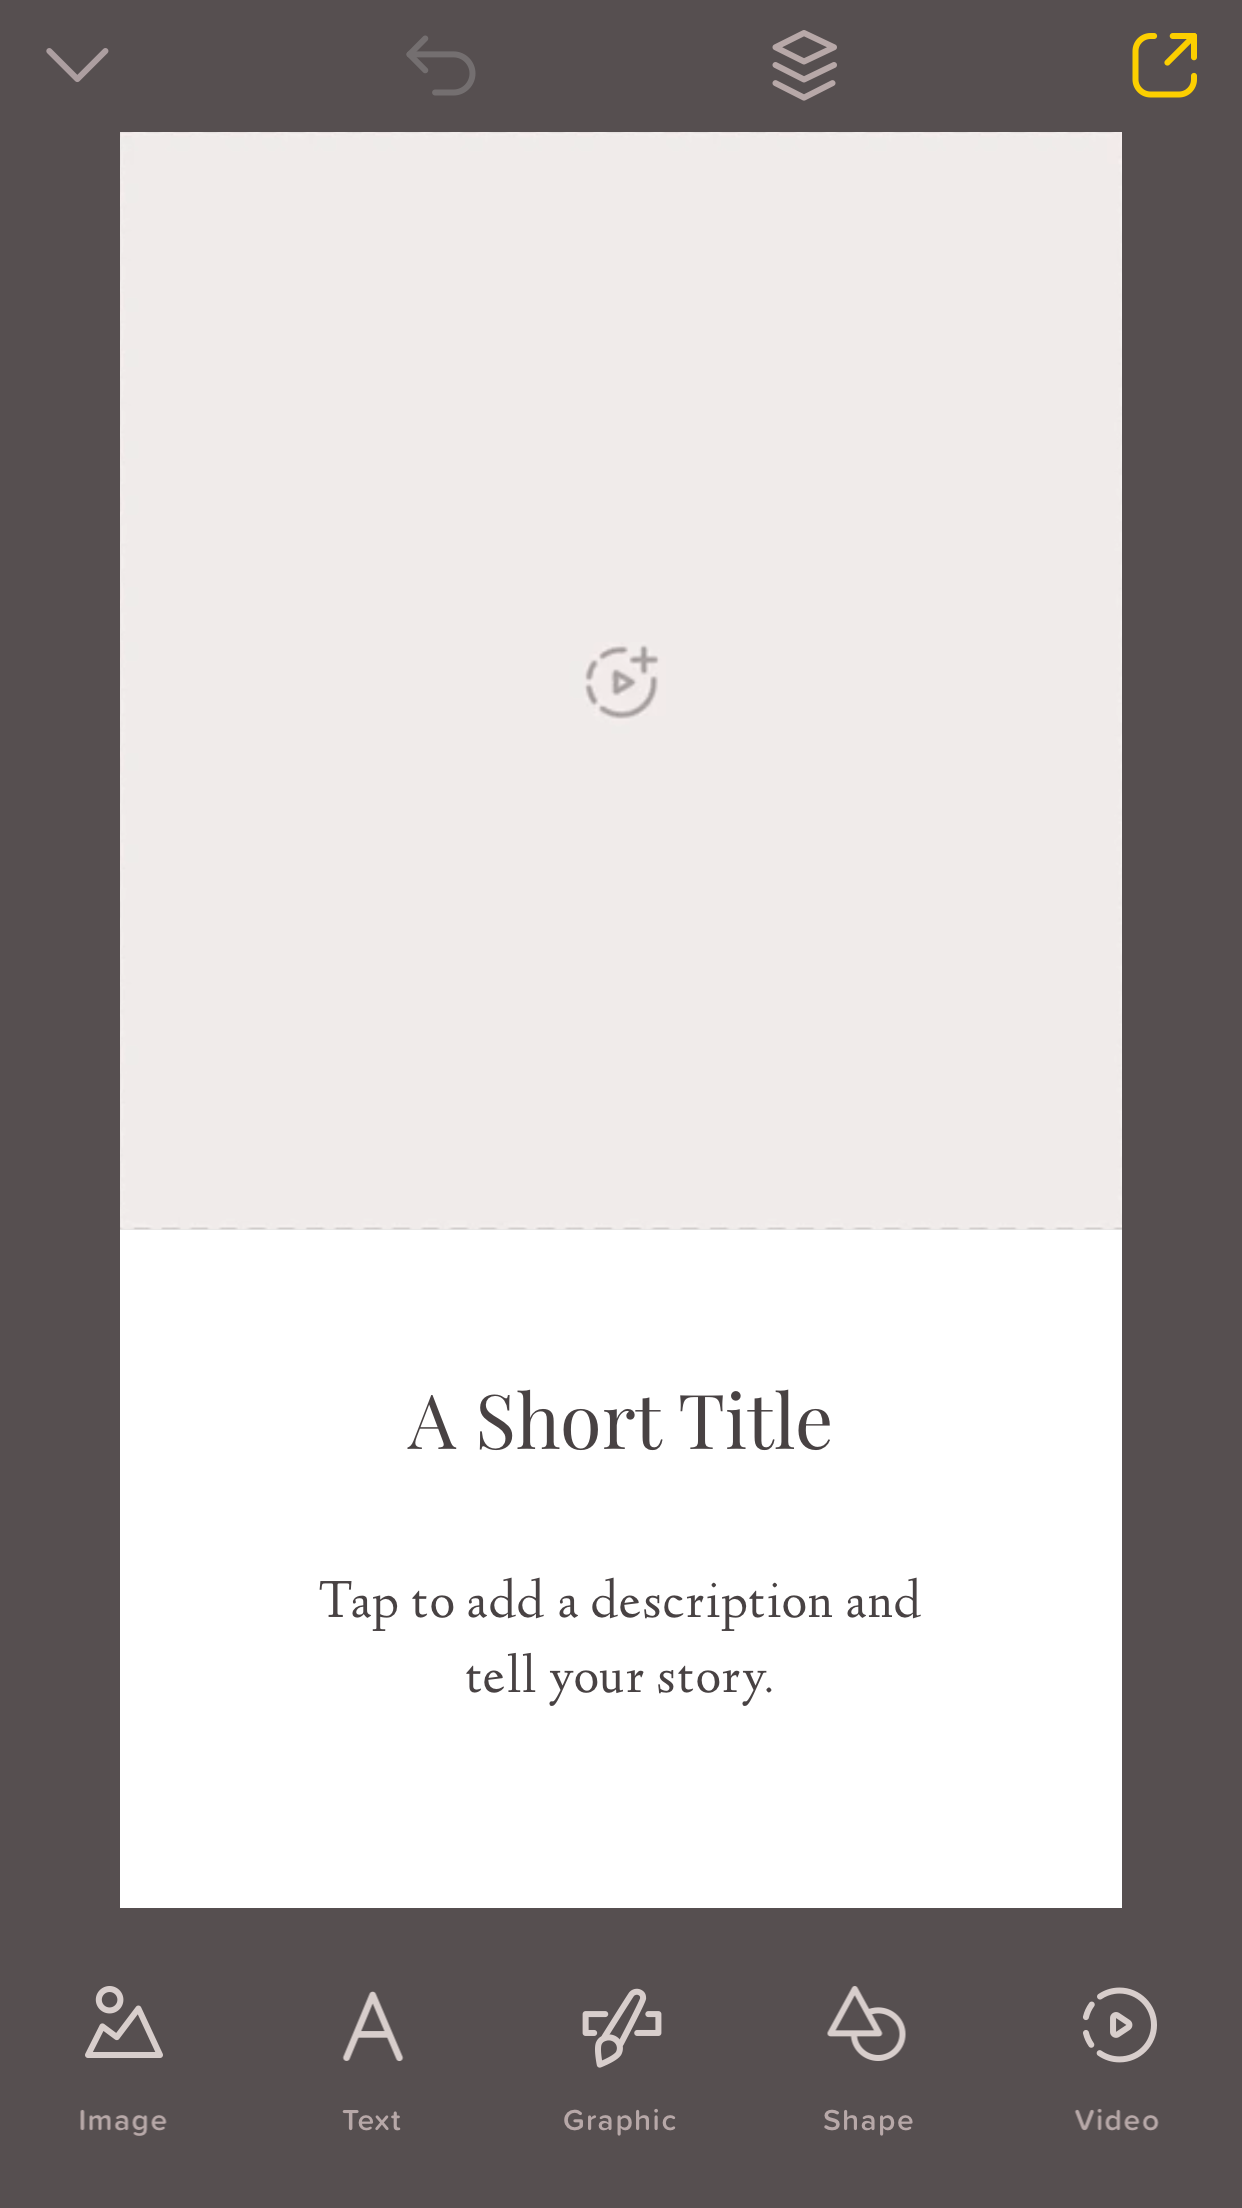 aplikacje do insta story over